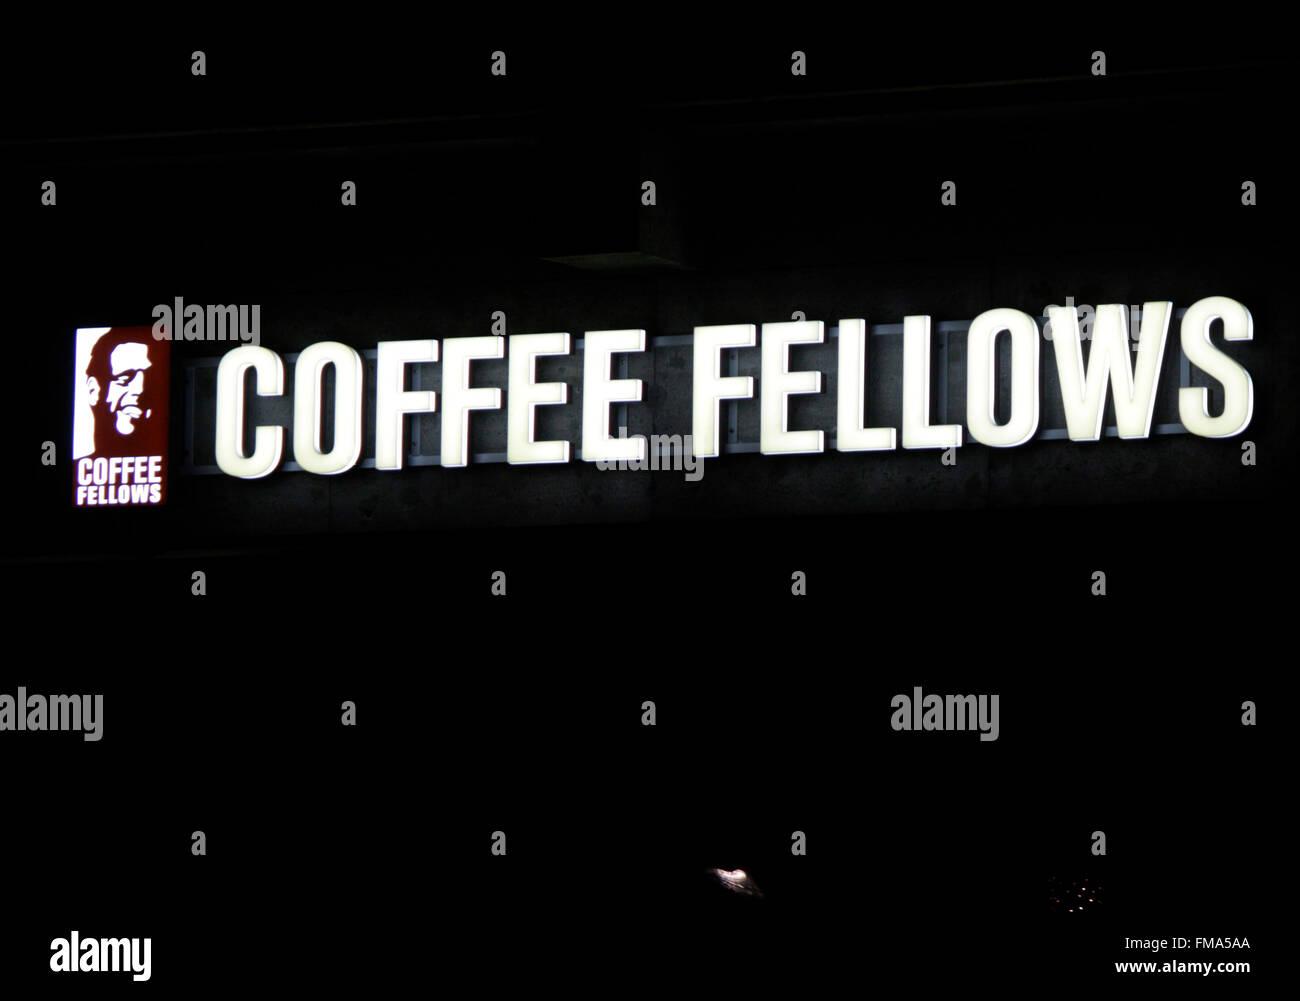 Markenname: 'Coffee Fellows', Dezember 2013, Berlin. - Stock Image